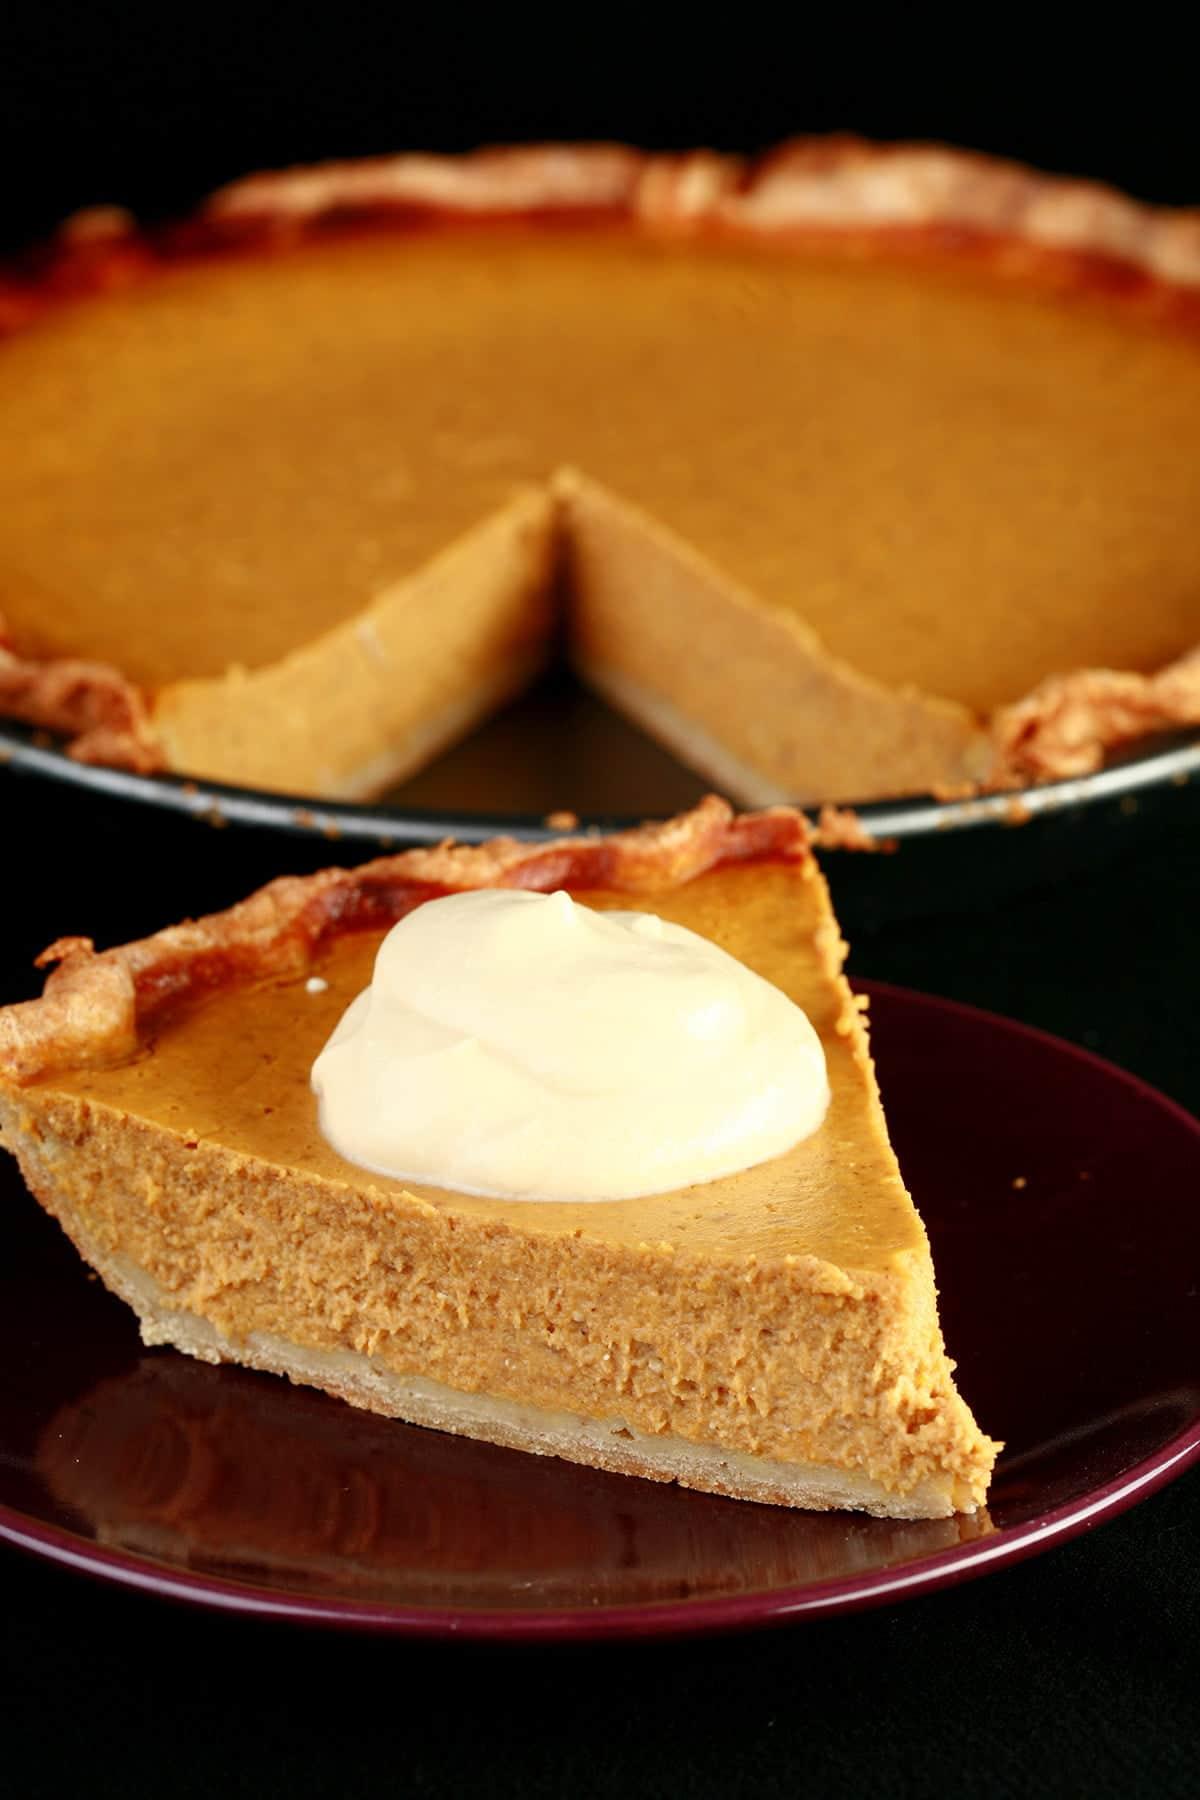 A slice of gluten-free maple pumpkin pie with maple cream, in front of a whole pumpkin pie.